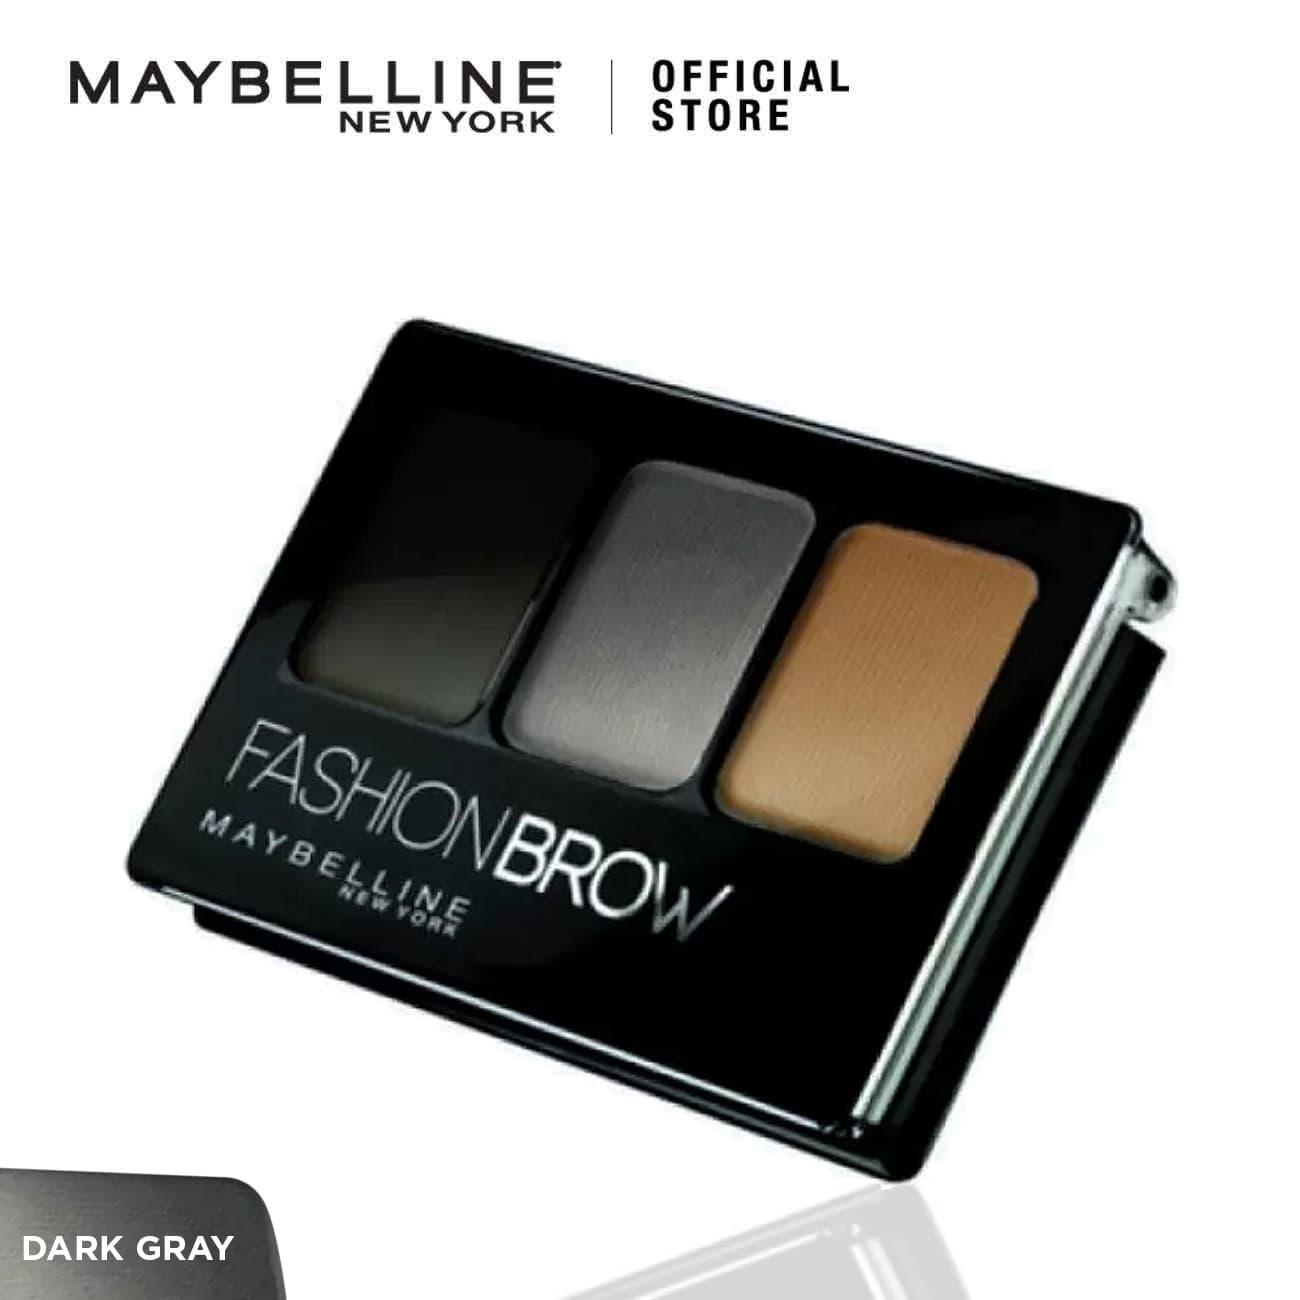 Maybelline Fashion Brow Pallette Make Up - Dark Gray thumbnail